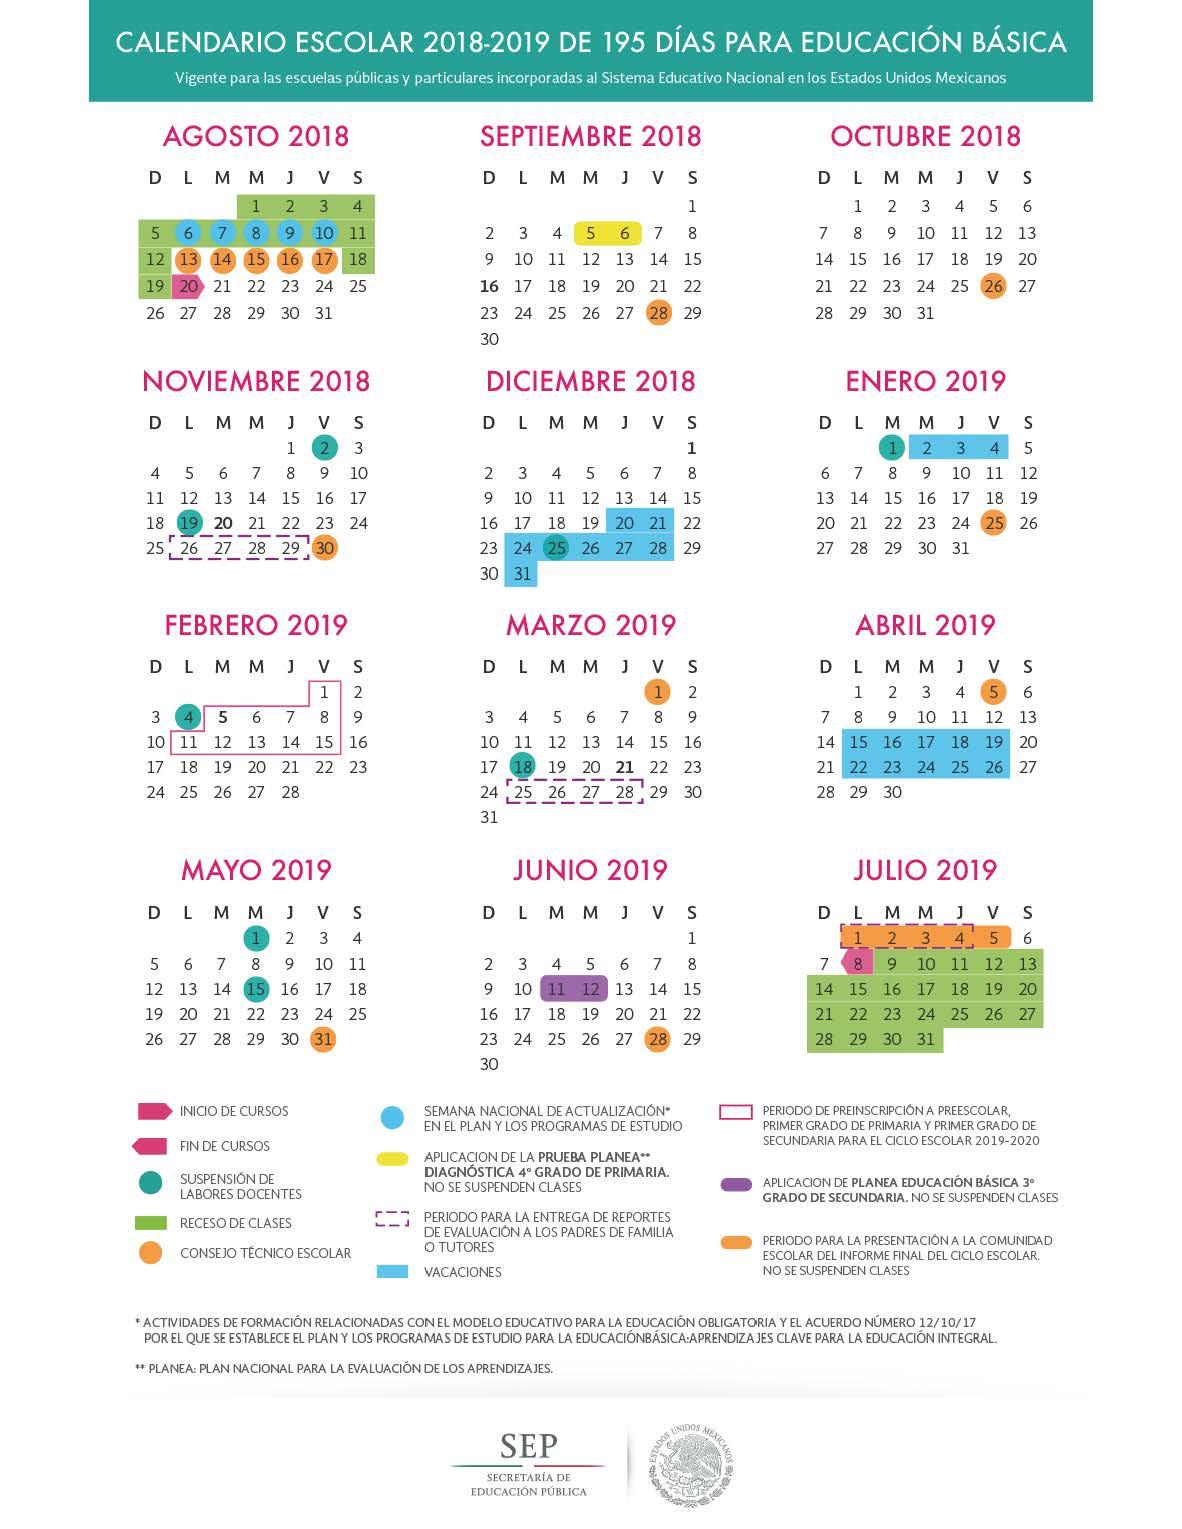 Calendario Escolar 2018 2019 Sep 185 195 Y 200 Días